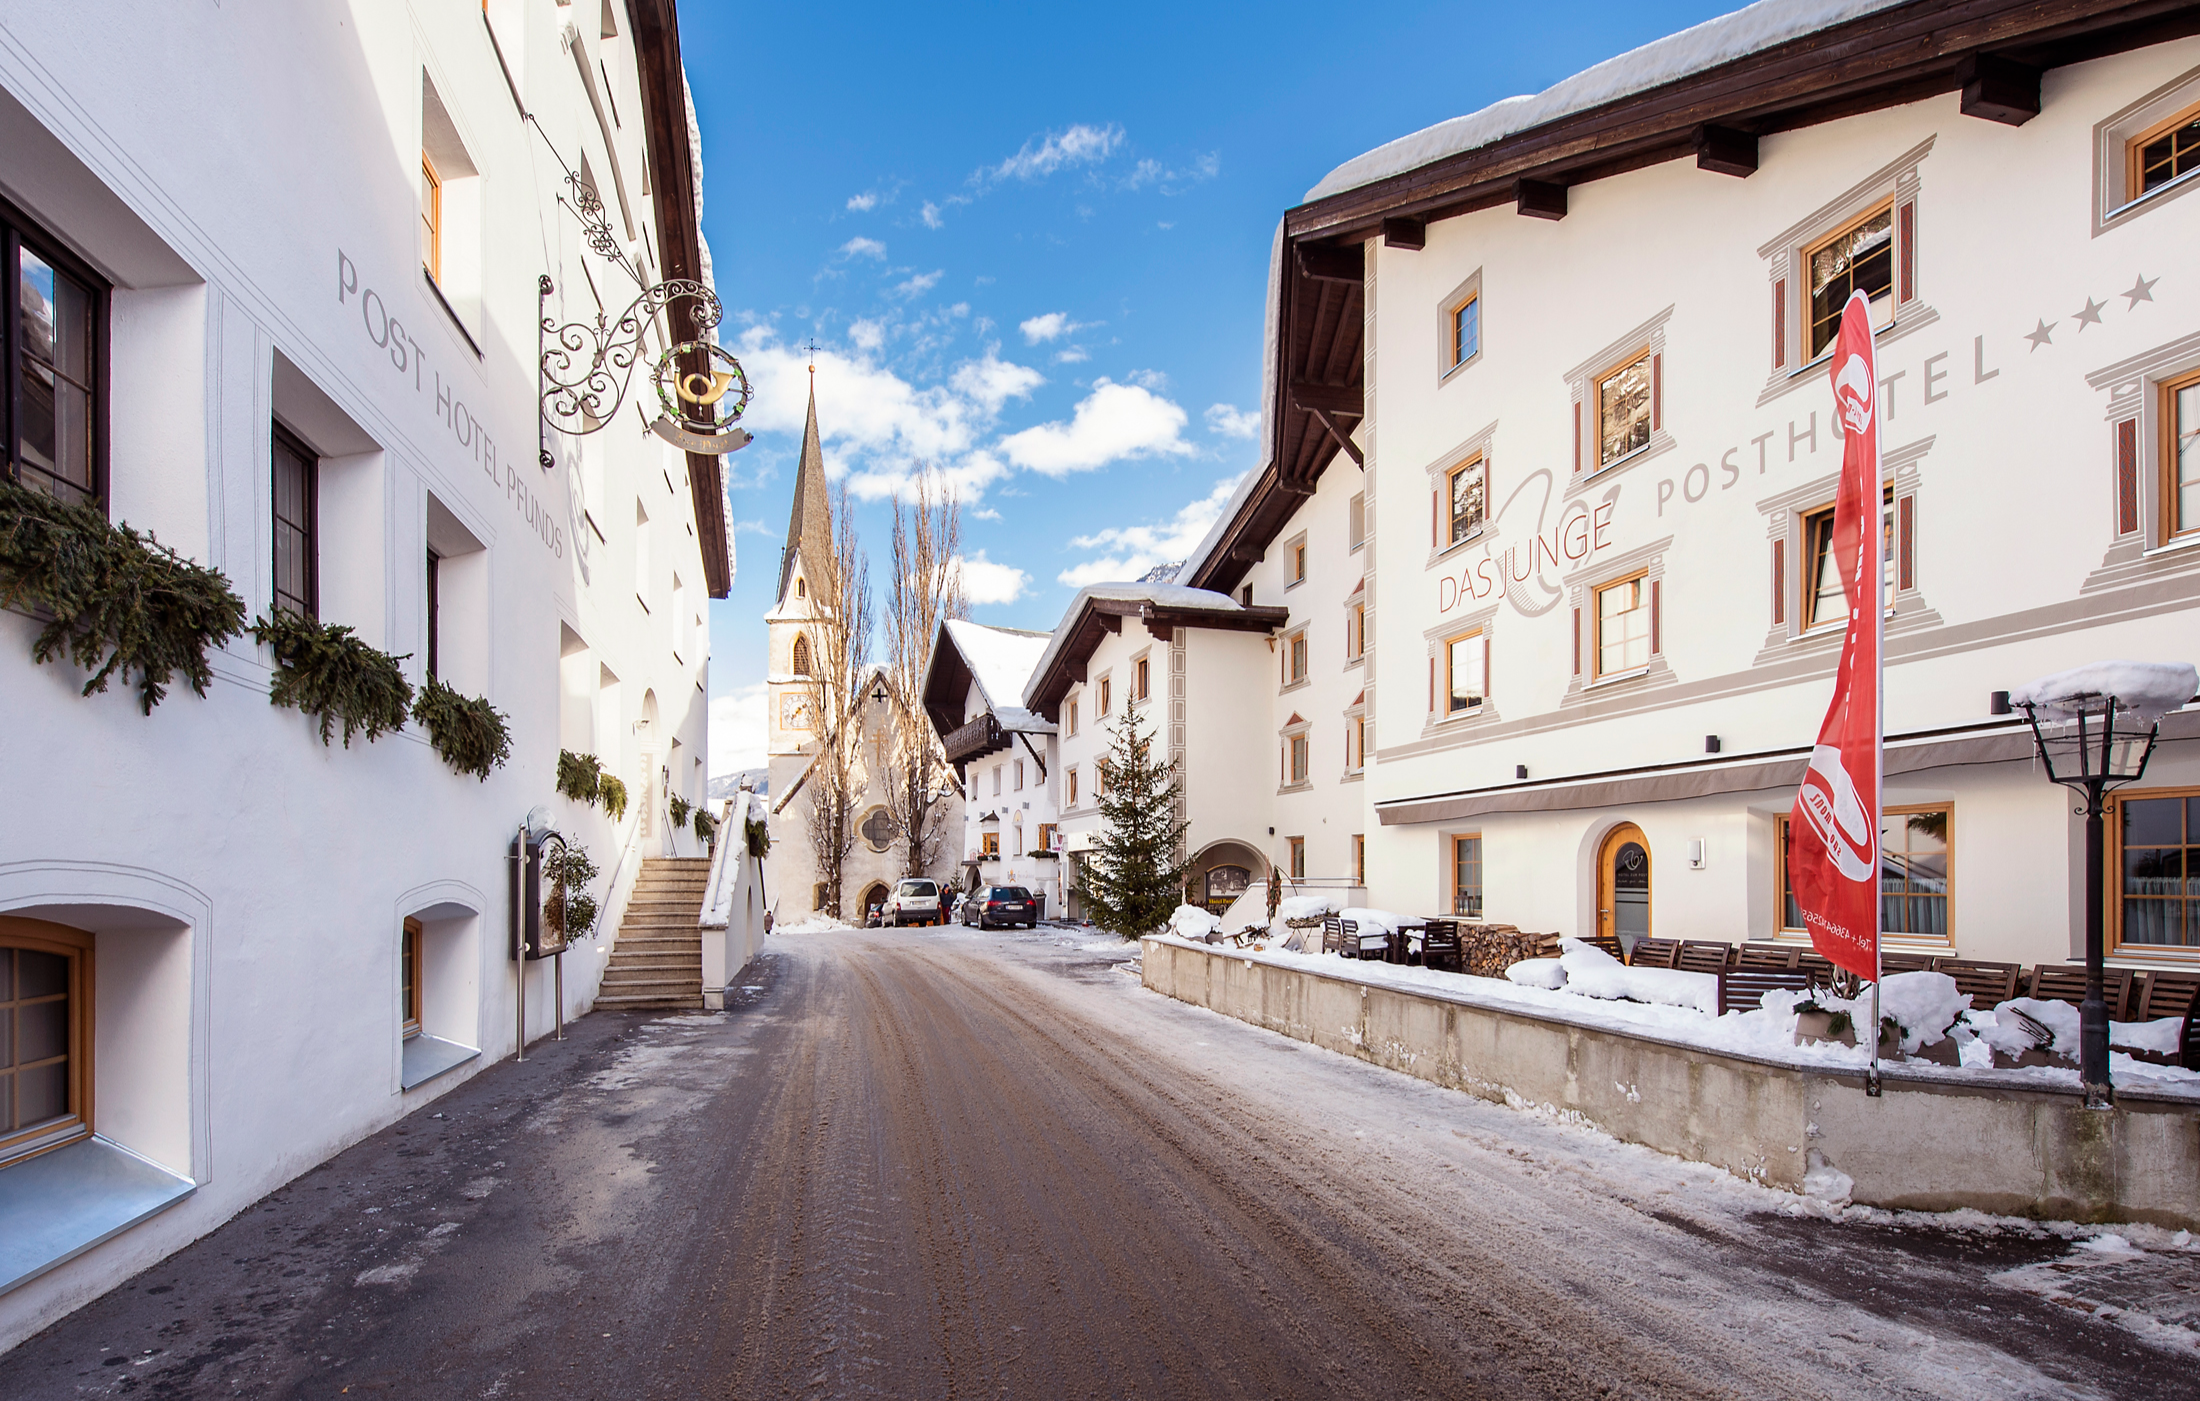 aktivurlaub-im-schnee-samnaun-bg41610548251